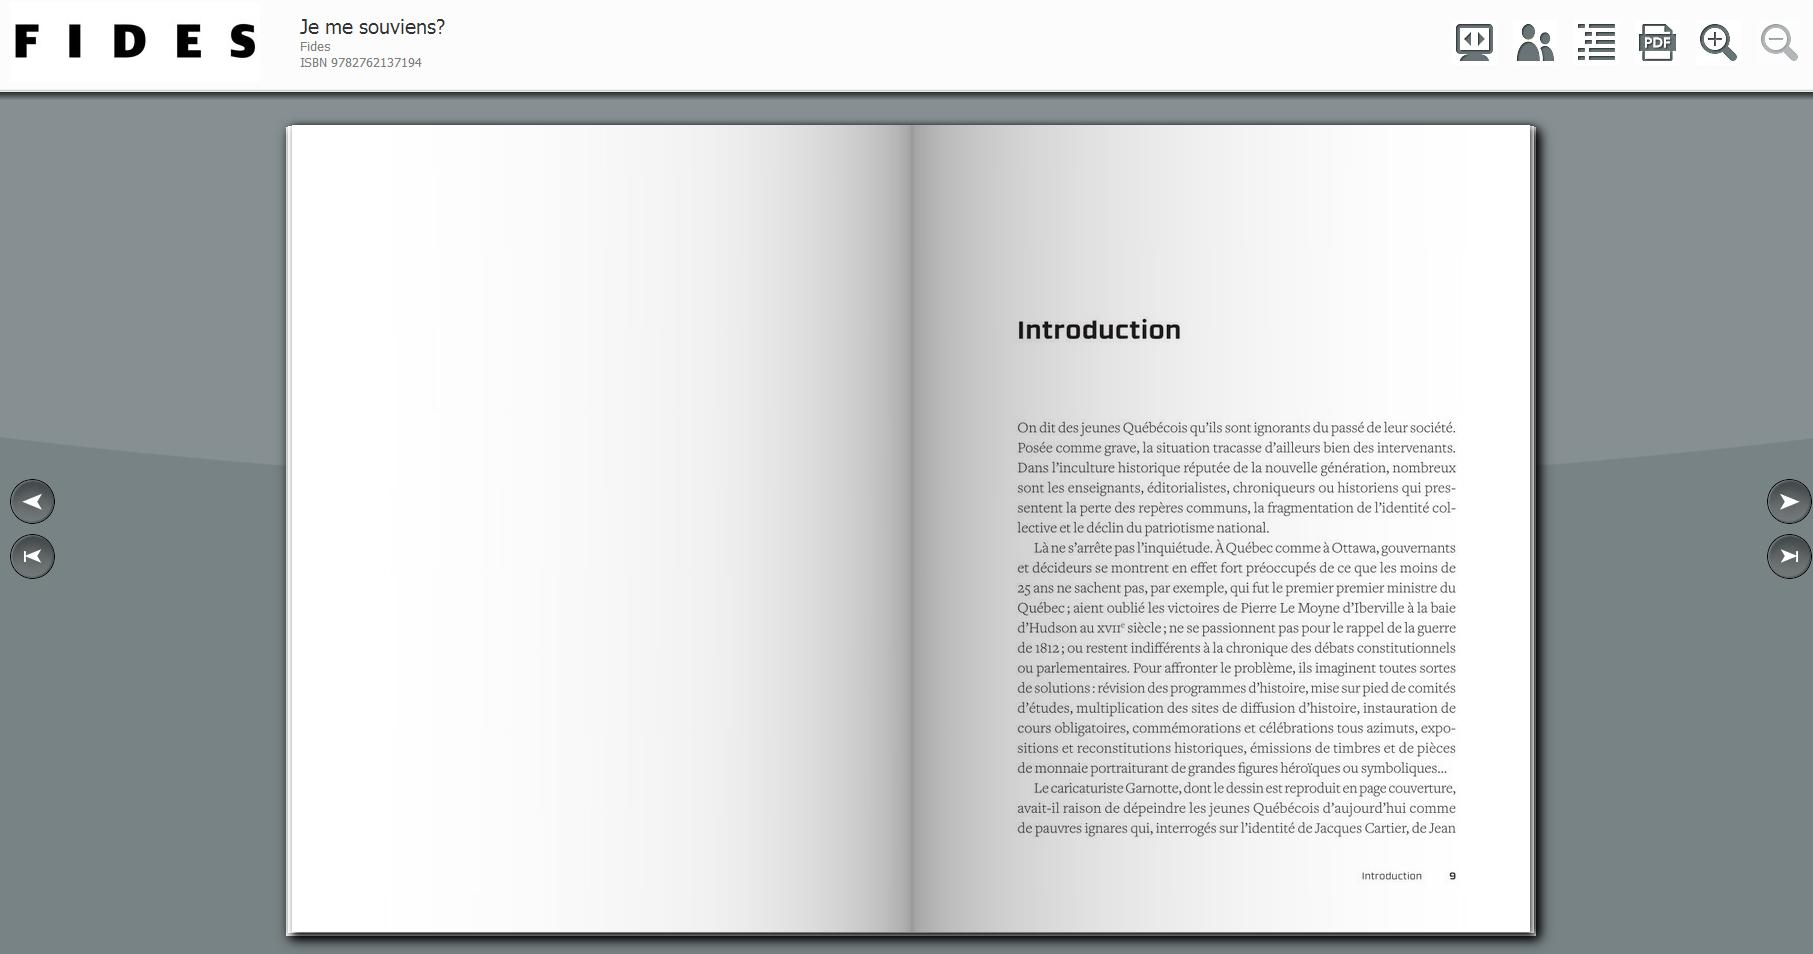 flipbook introduction